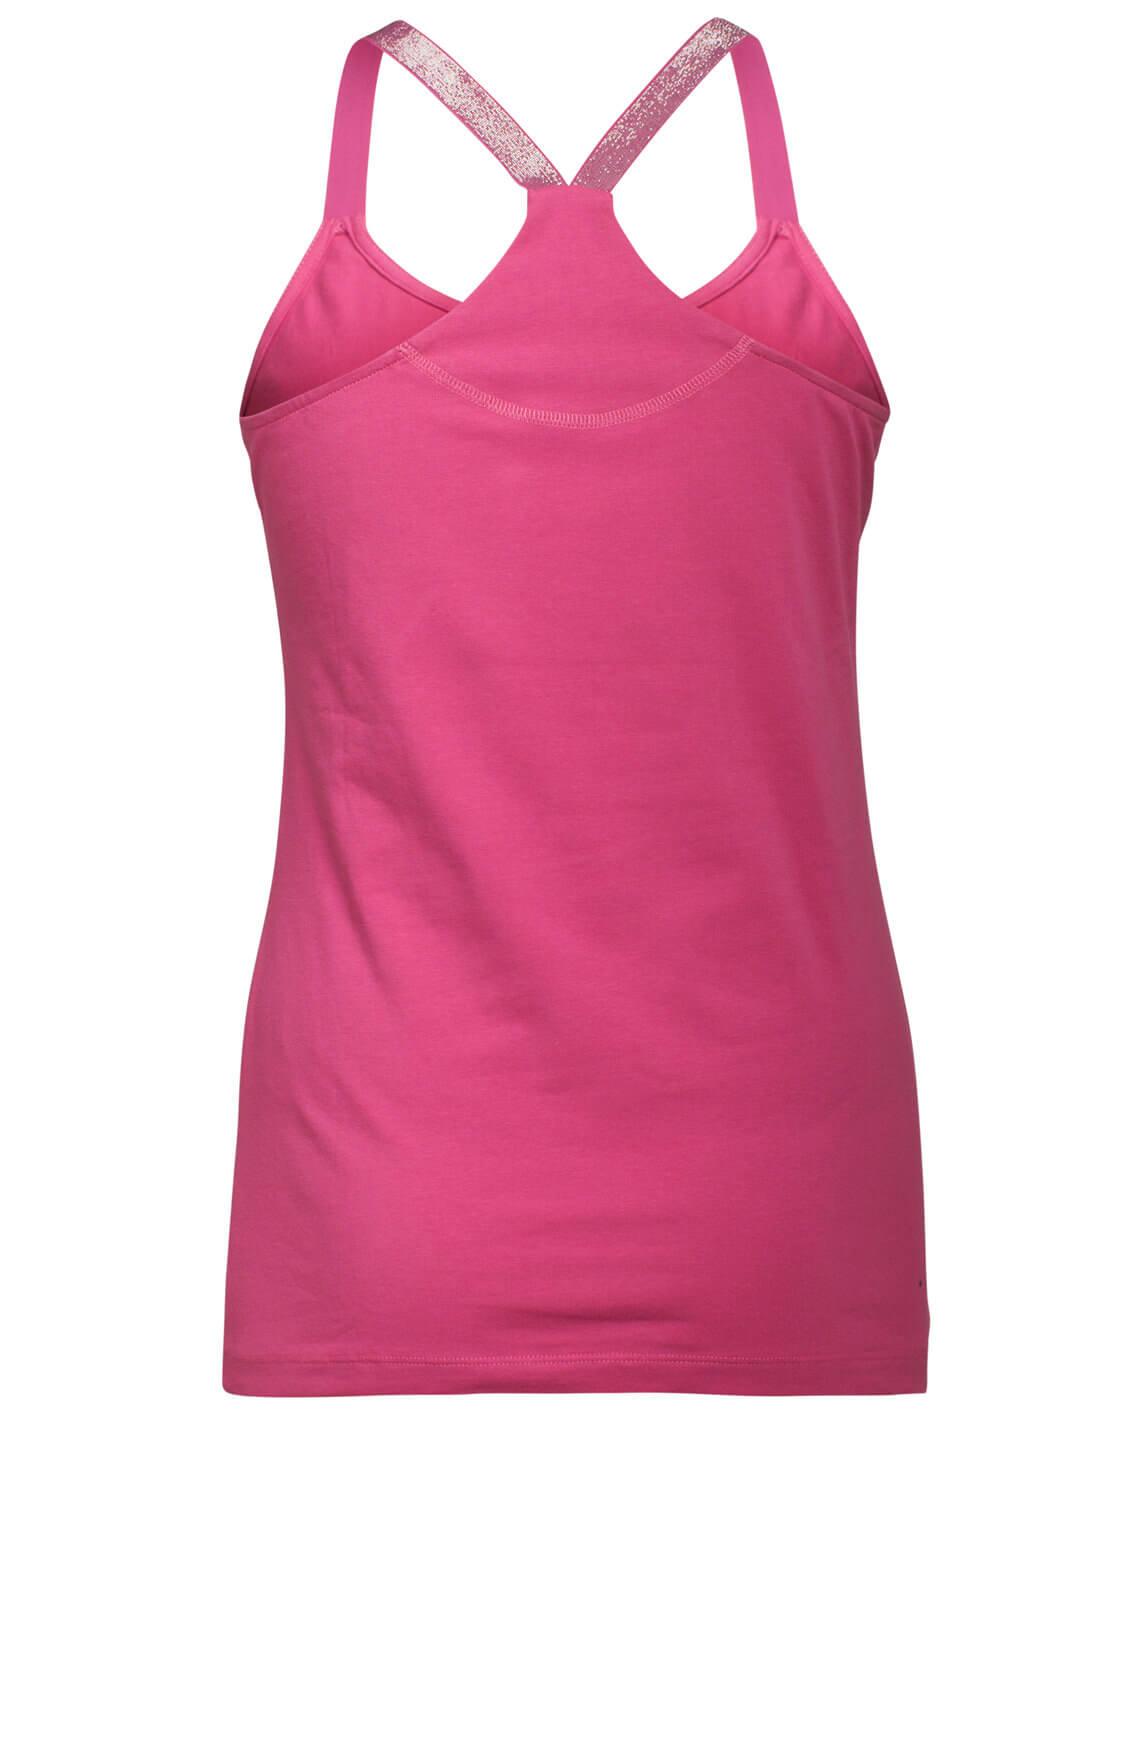 Anna Dames Top met glitterbandjes roze